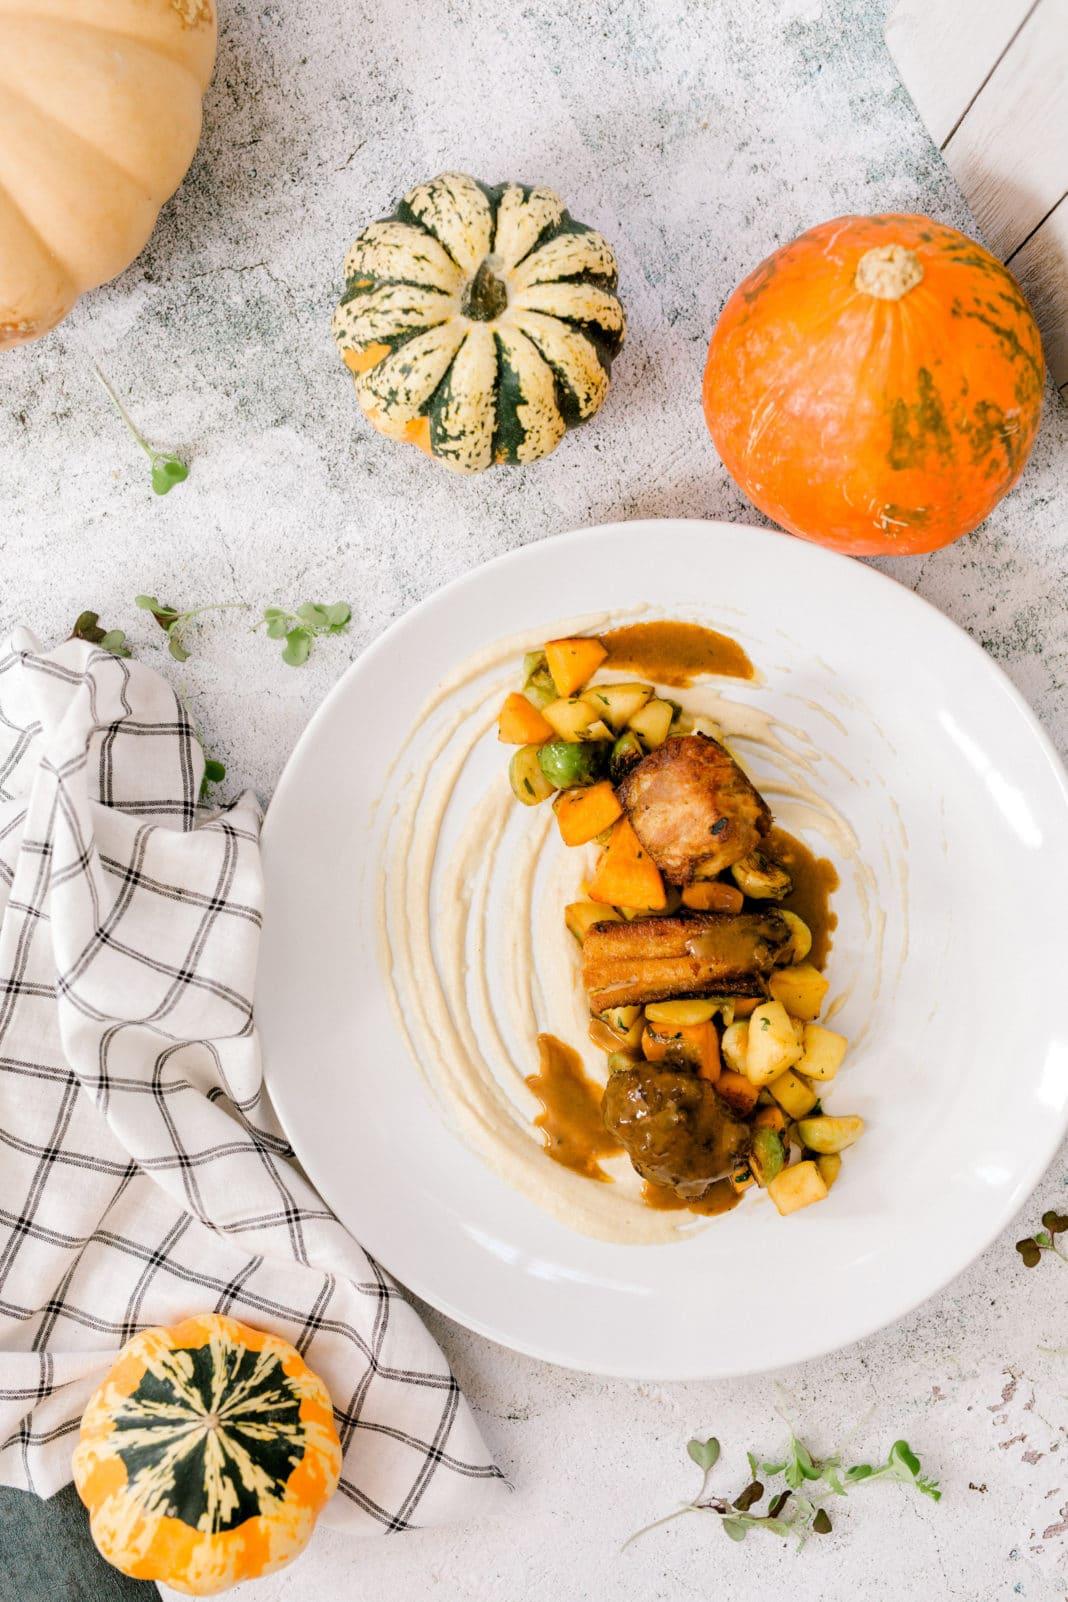 7 Best Restaurants In Chattanooga Tennessee Trekbible